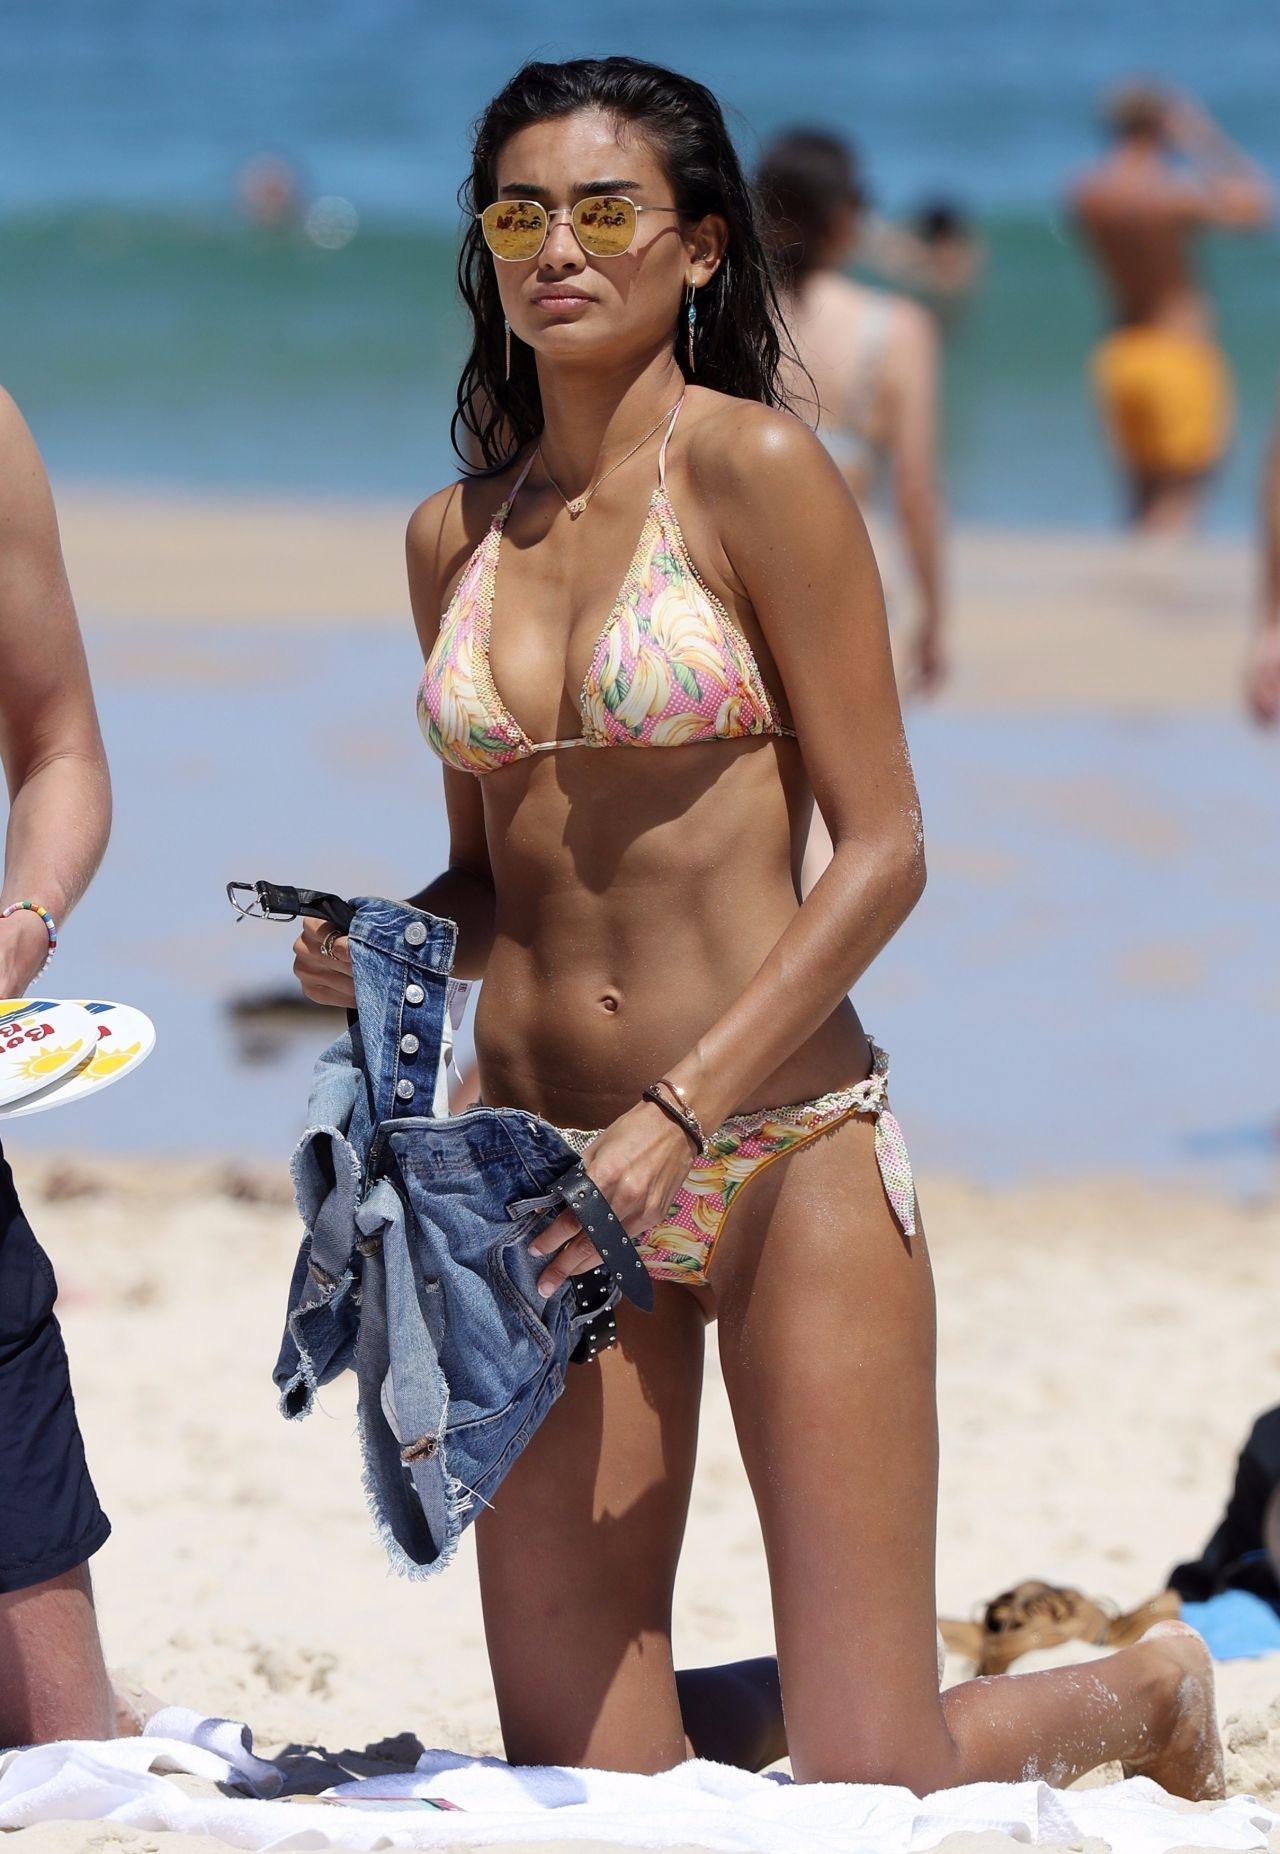 Kelly Gale in Bikini on Bondi Beach in Sydney Pic 8 of 35